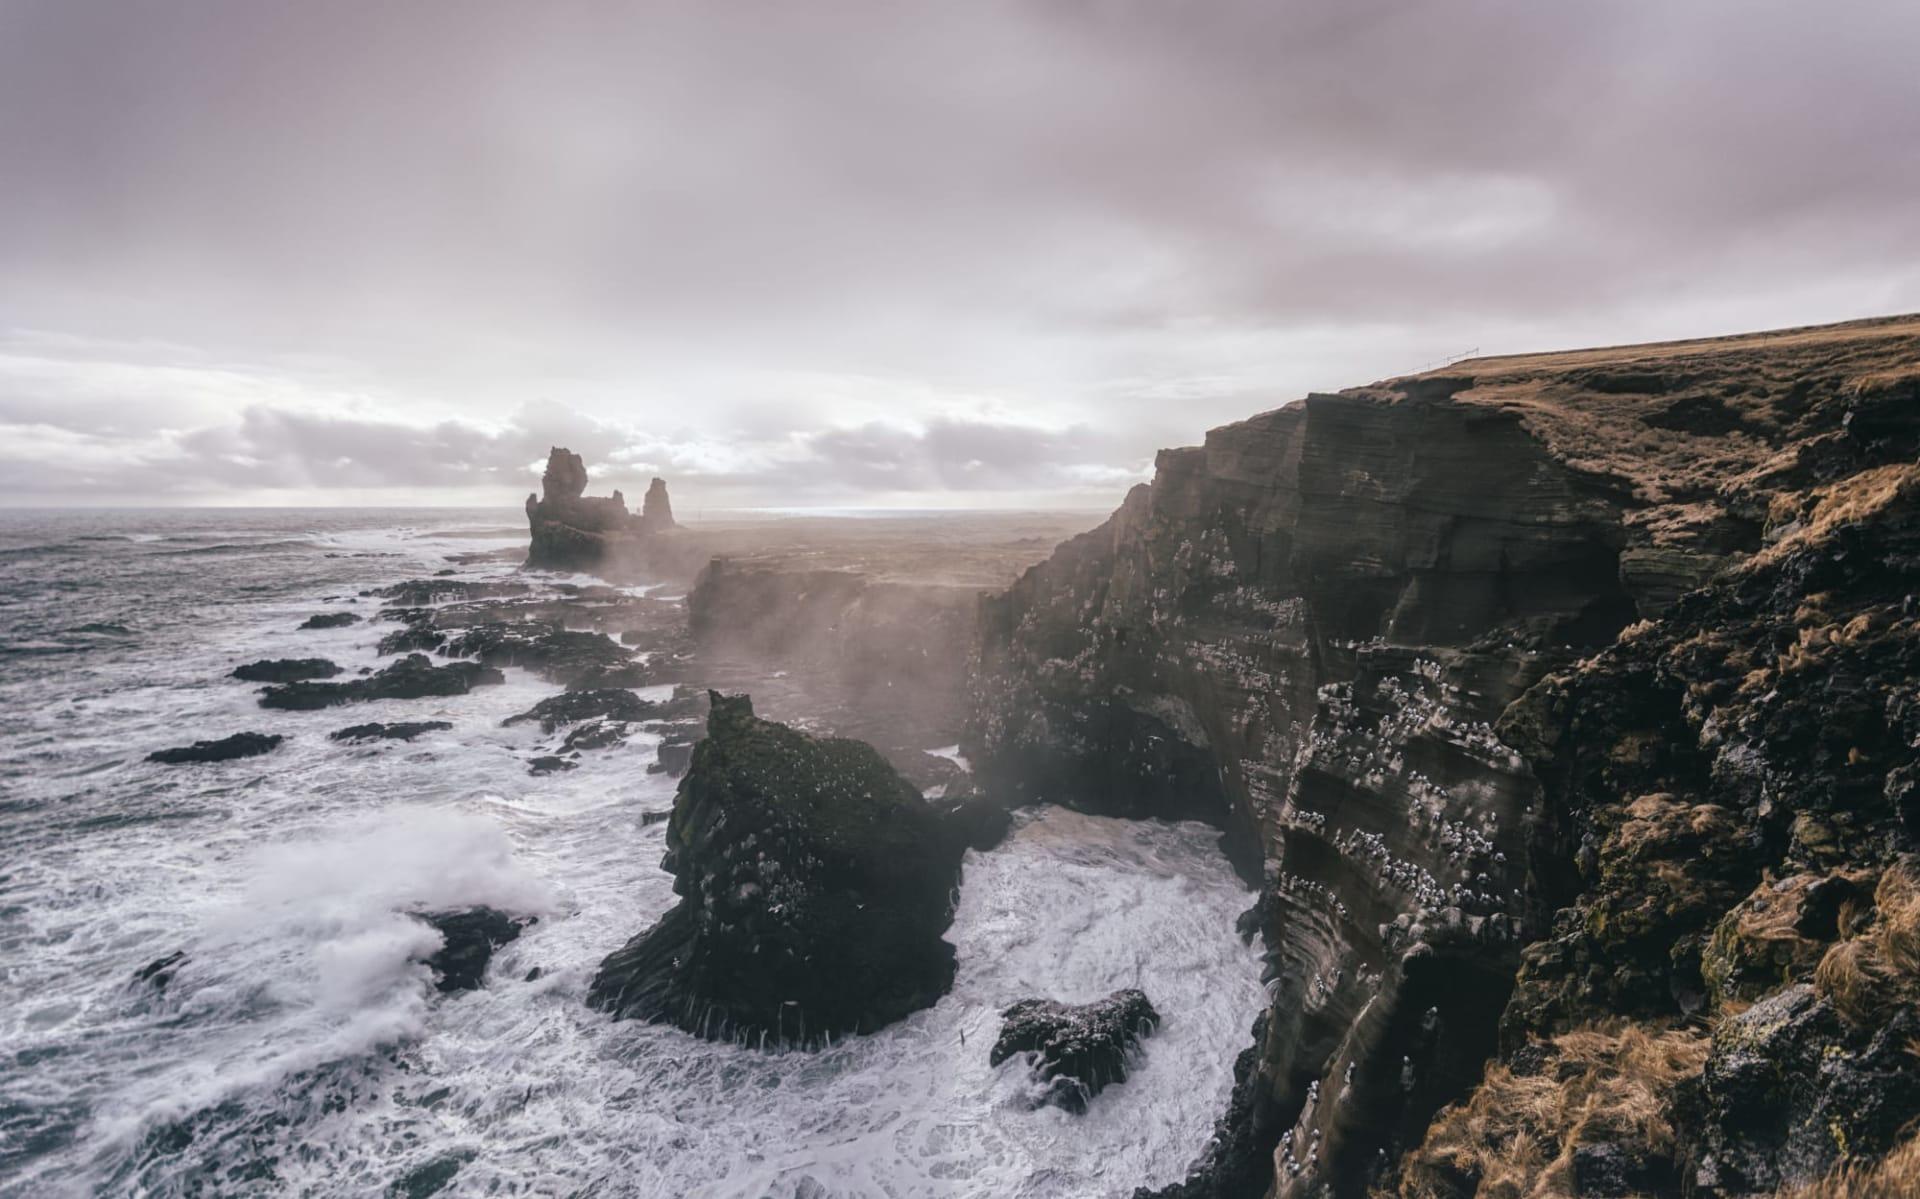 Hraunsnefi in Reykjavik: Dramatic seascape at Snaefellsnes Peninsula, Western Iceland